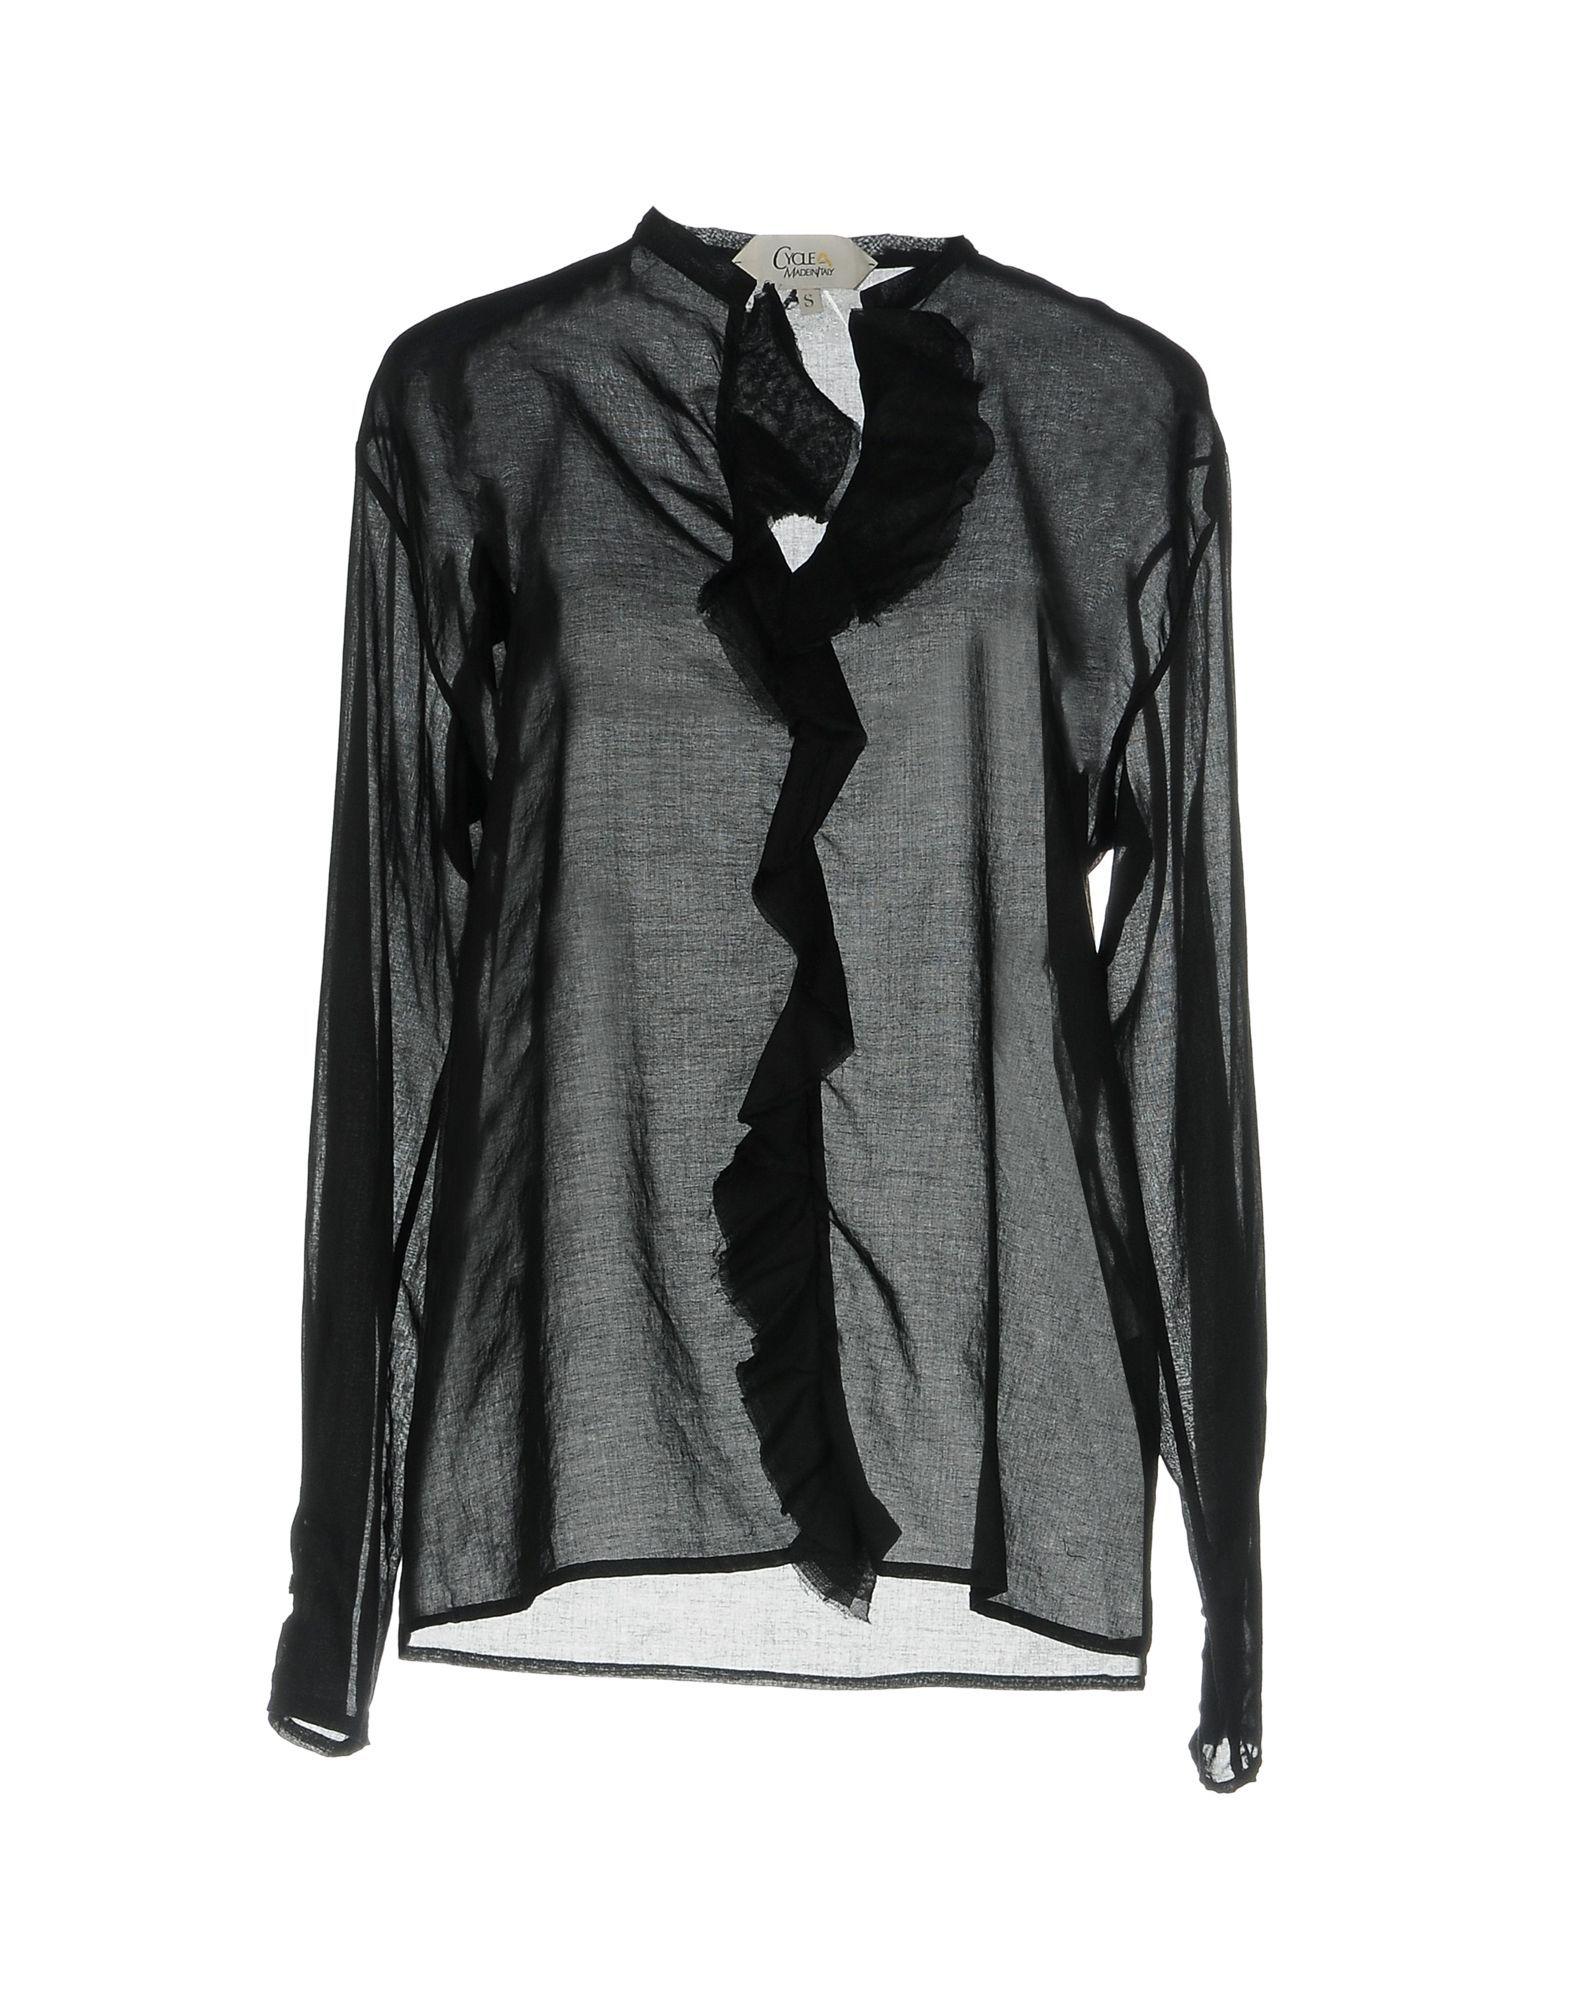 Cycle Black Cotton Shirt